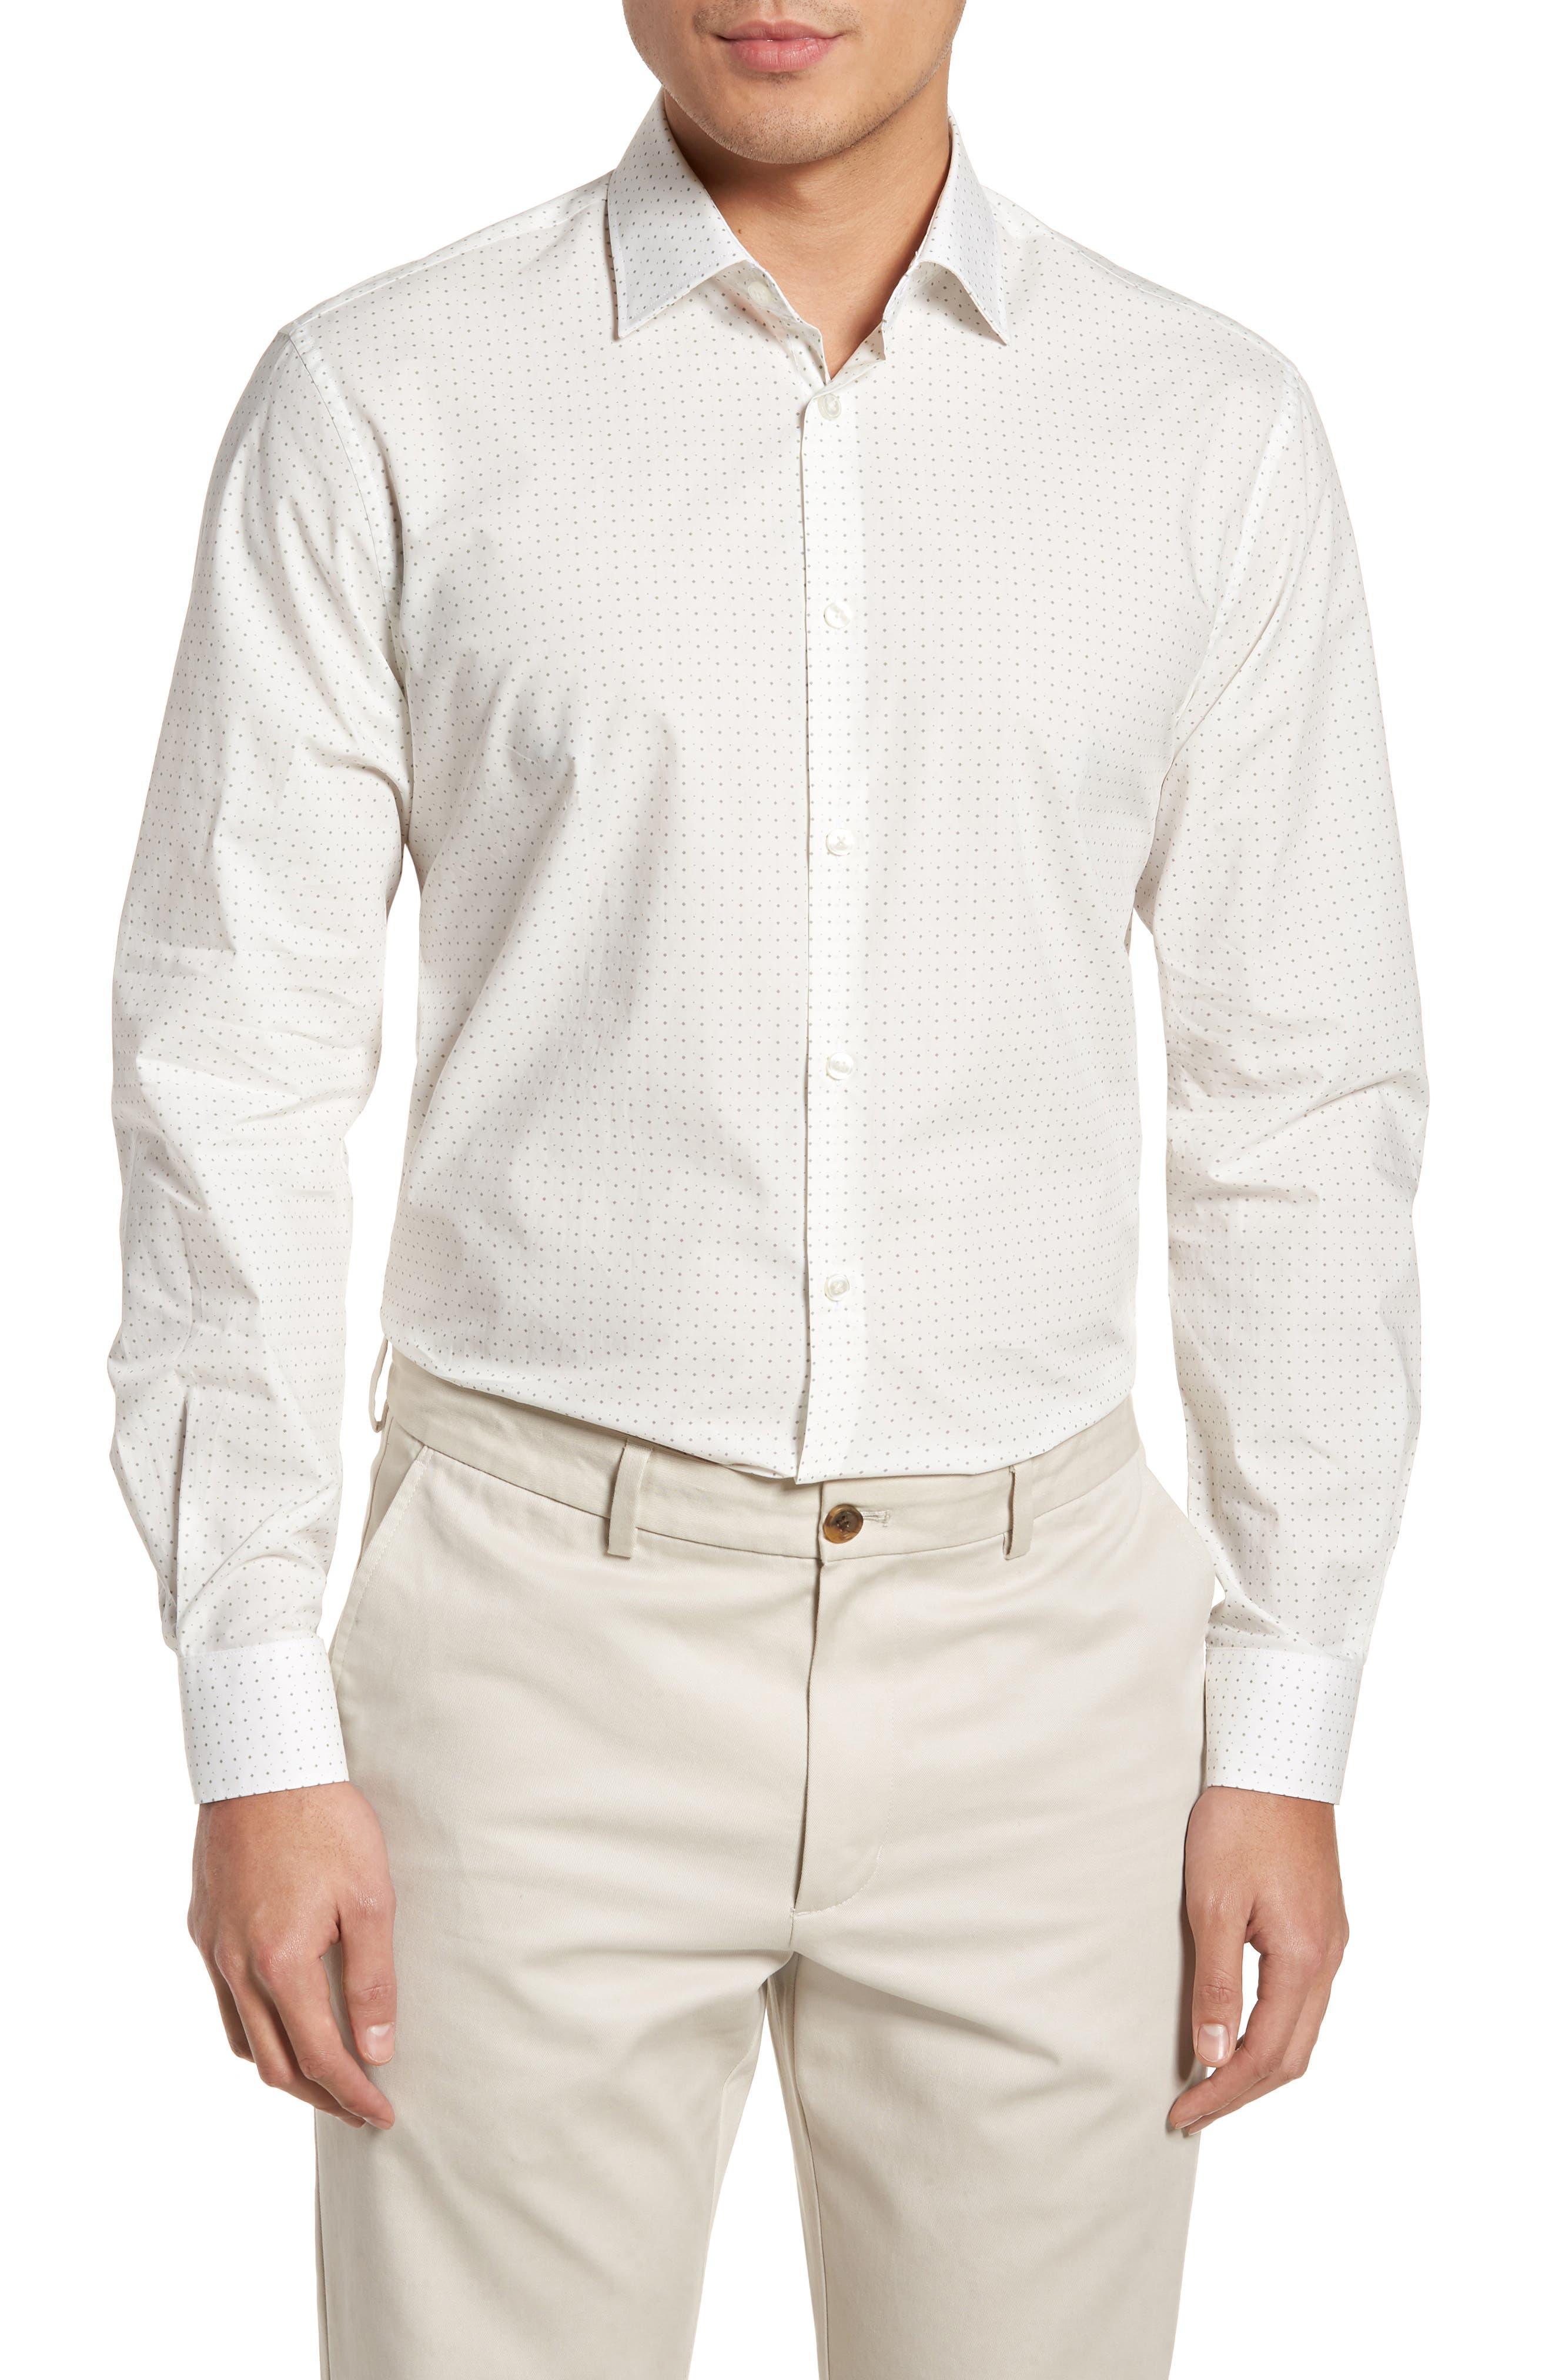 Regular Fit Diamond Dress Shirt,                         Main,                         color, GRIFFIN GREY